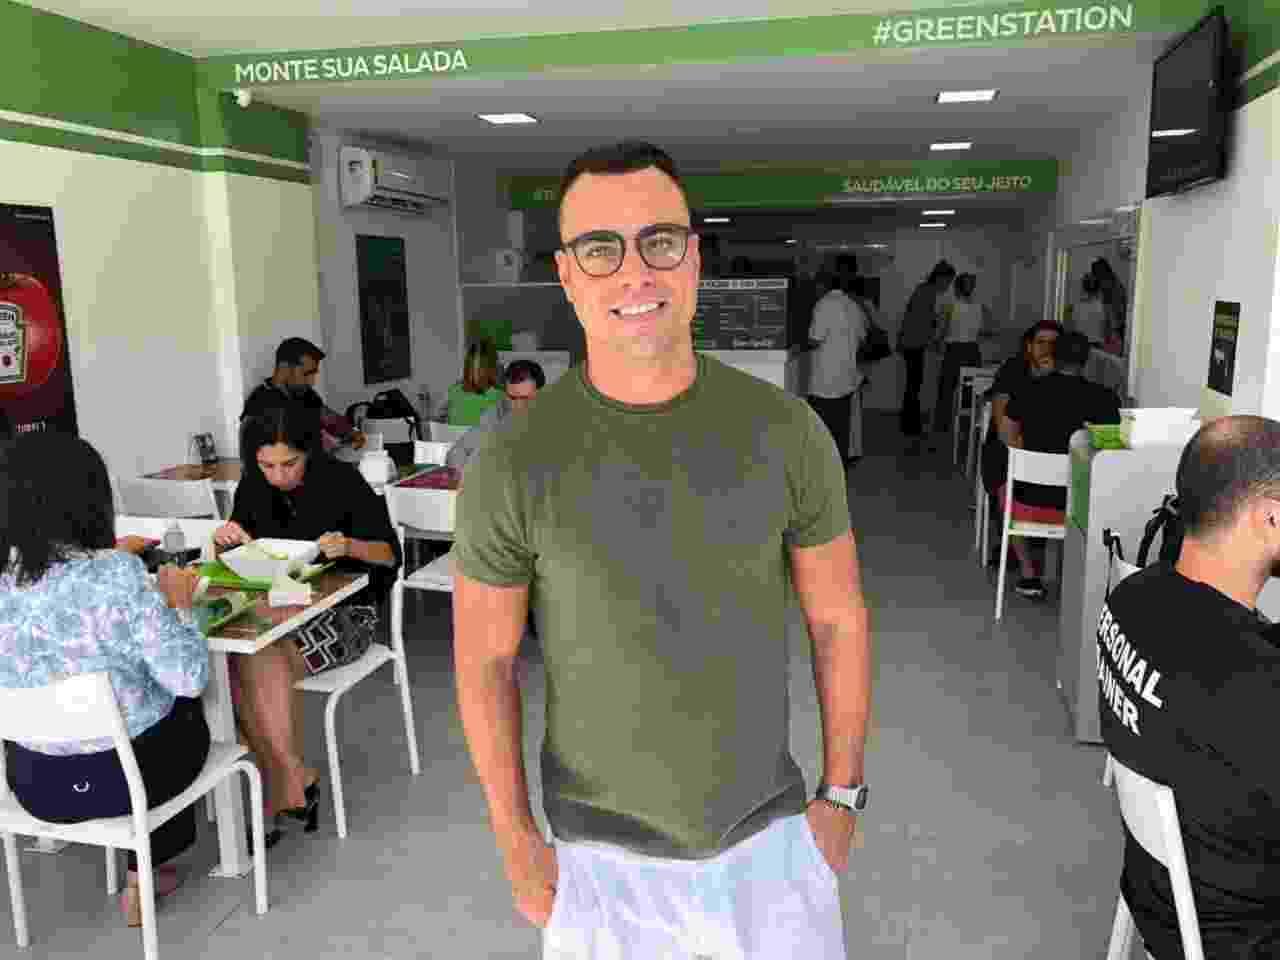 Green Station sócio Biel Maciel - Divulgação